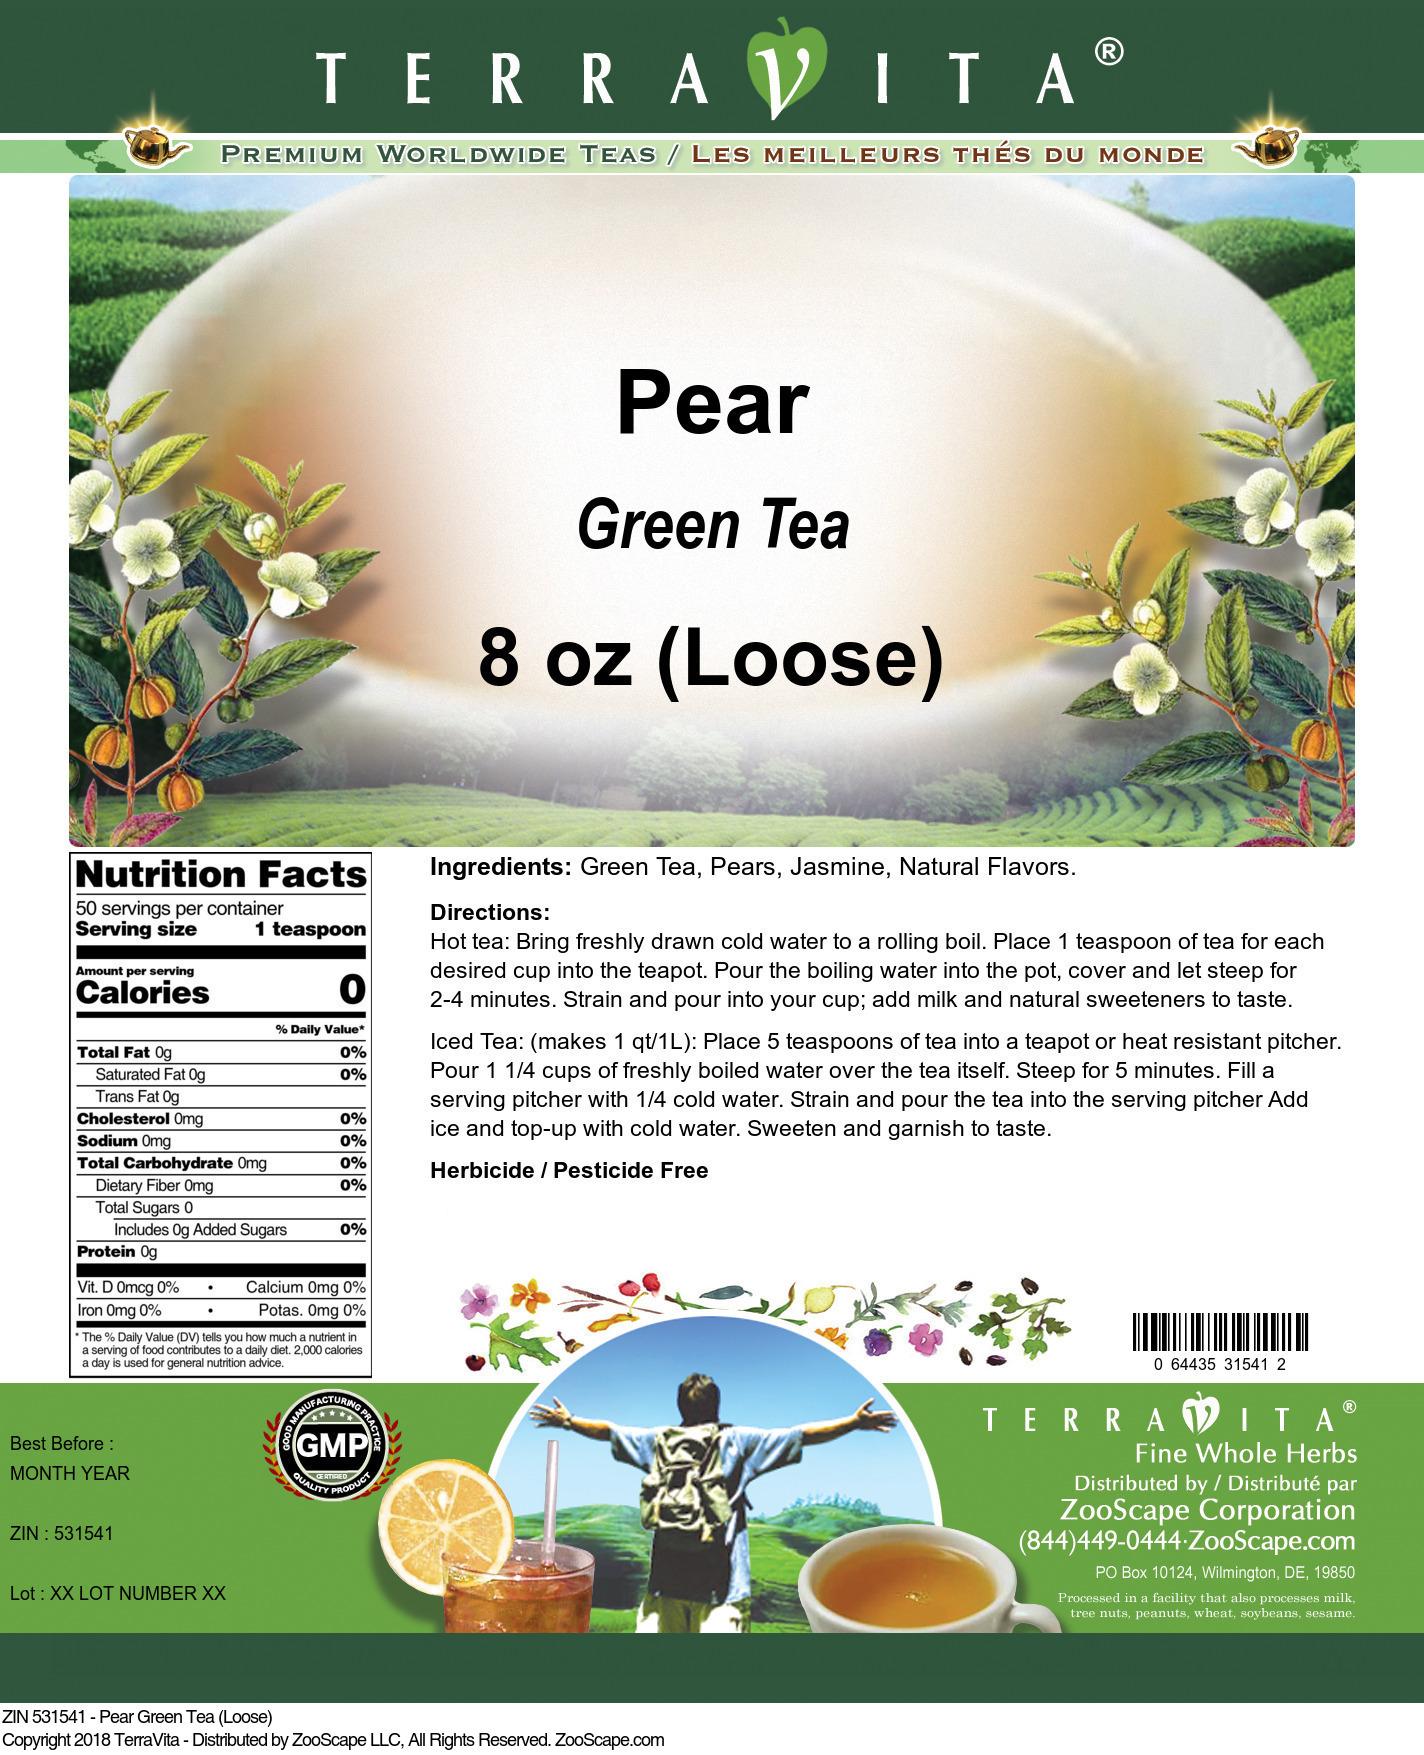 Pear Green Tea